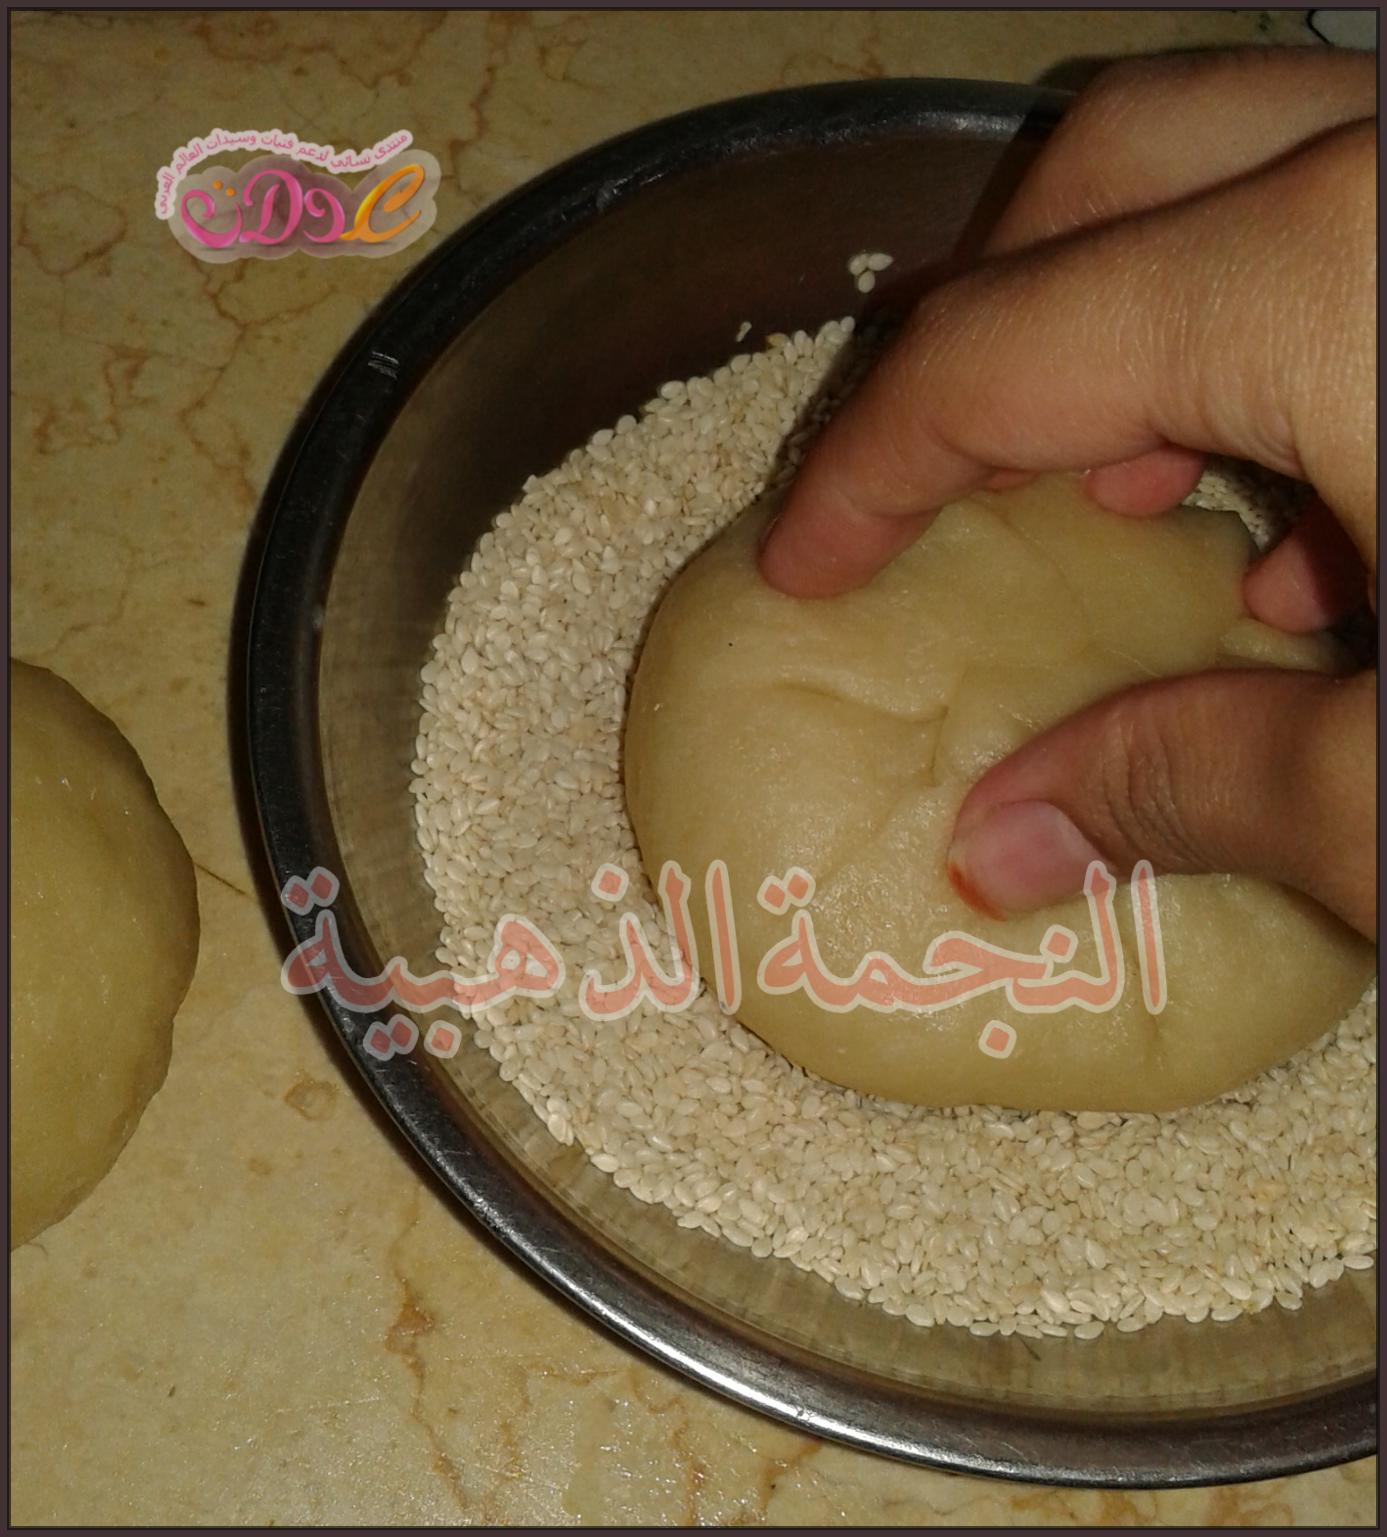 مطبخي] محشوه بالسكر .قرص بالسمسم لذيذه 3dlat.com_07_18_4b1c